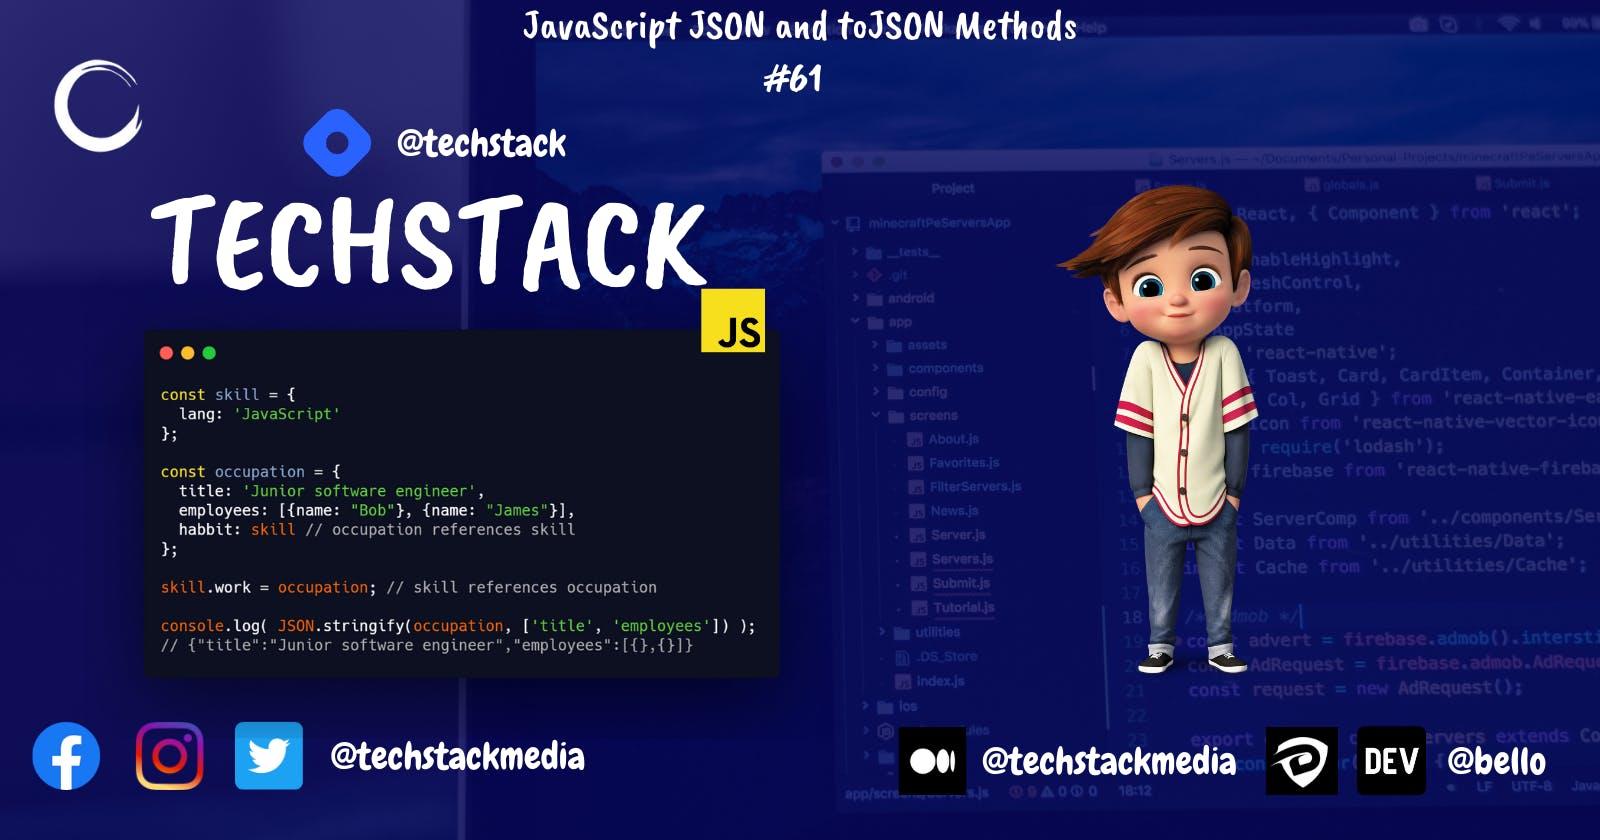 JavaScript JSON and toJSON Methods